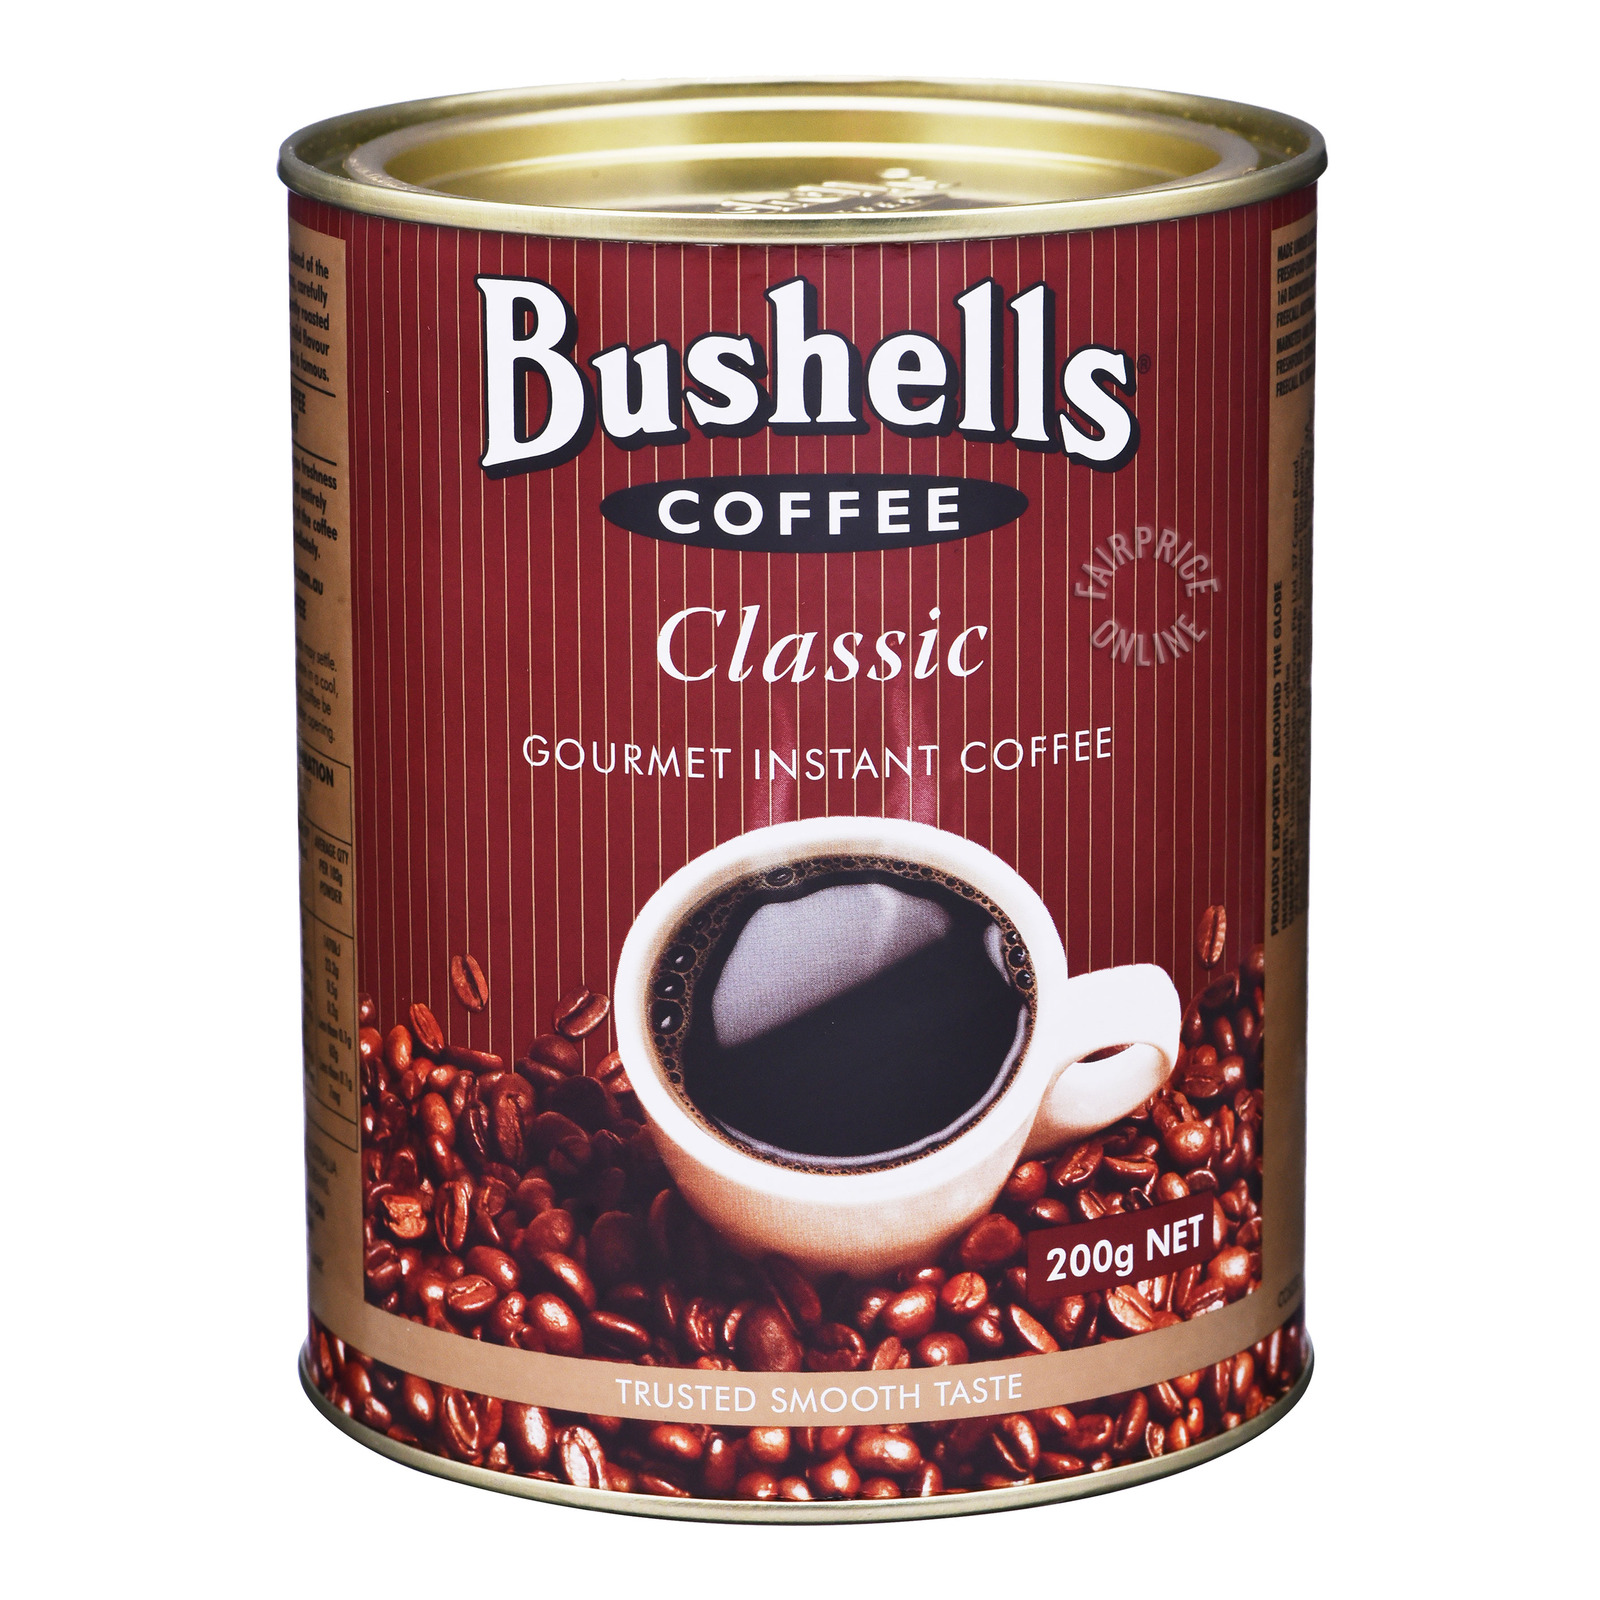 Bushells Gourment Instant Coffee - Classic